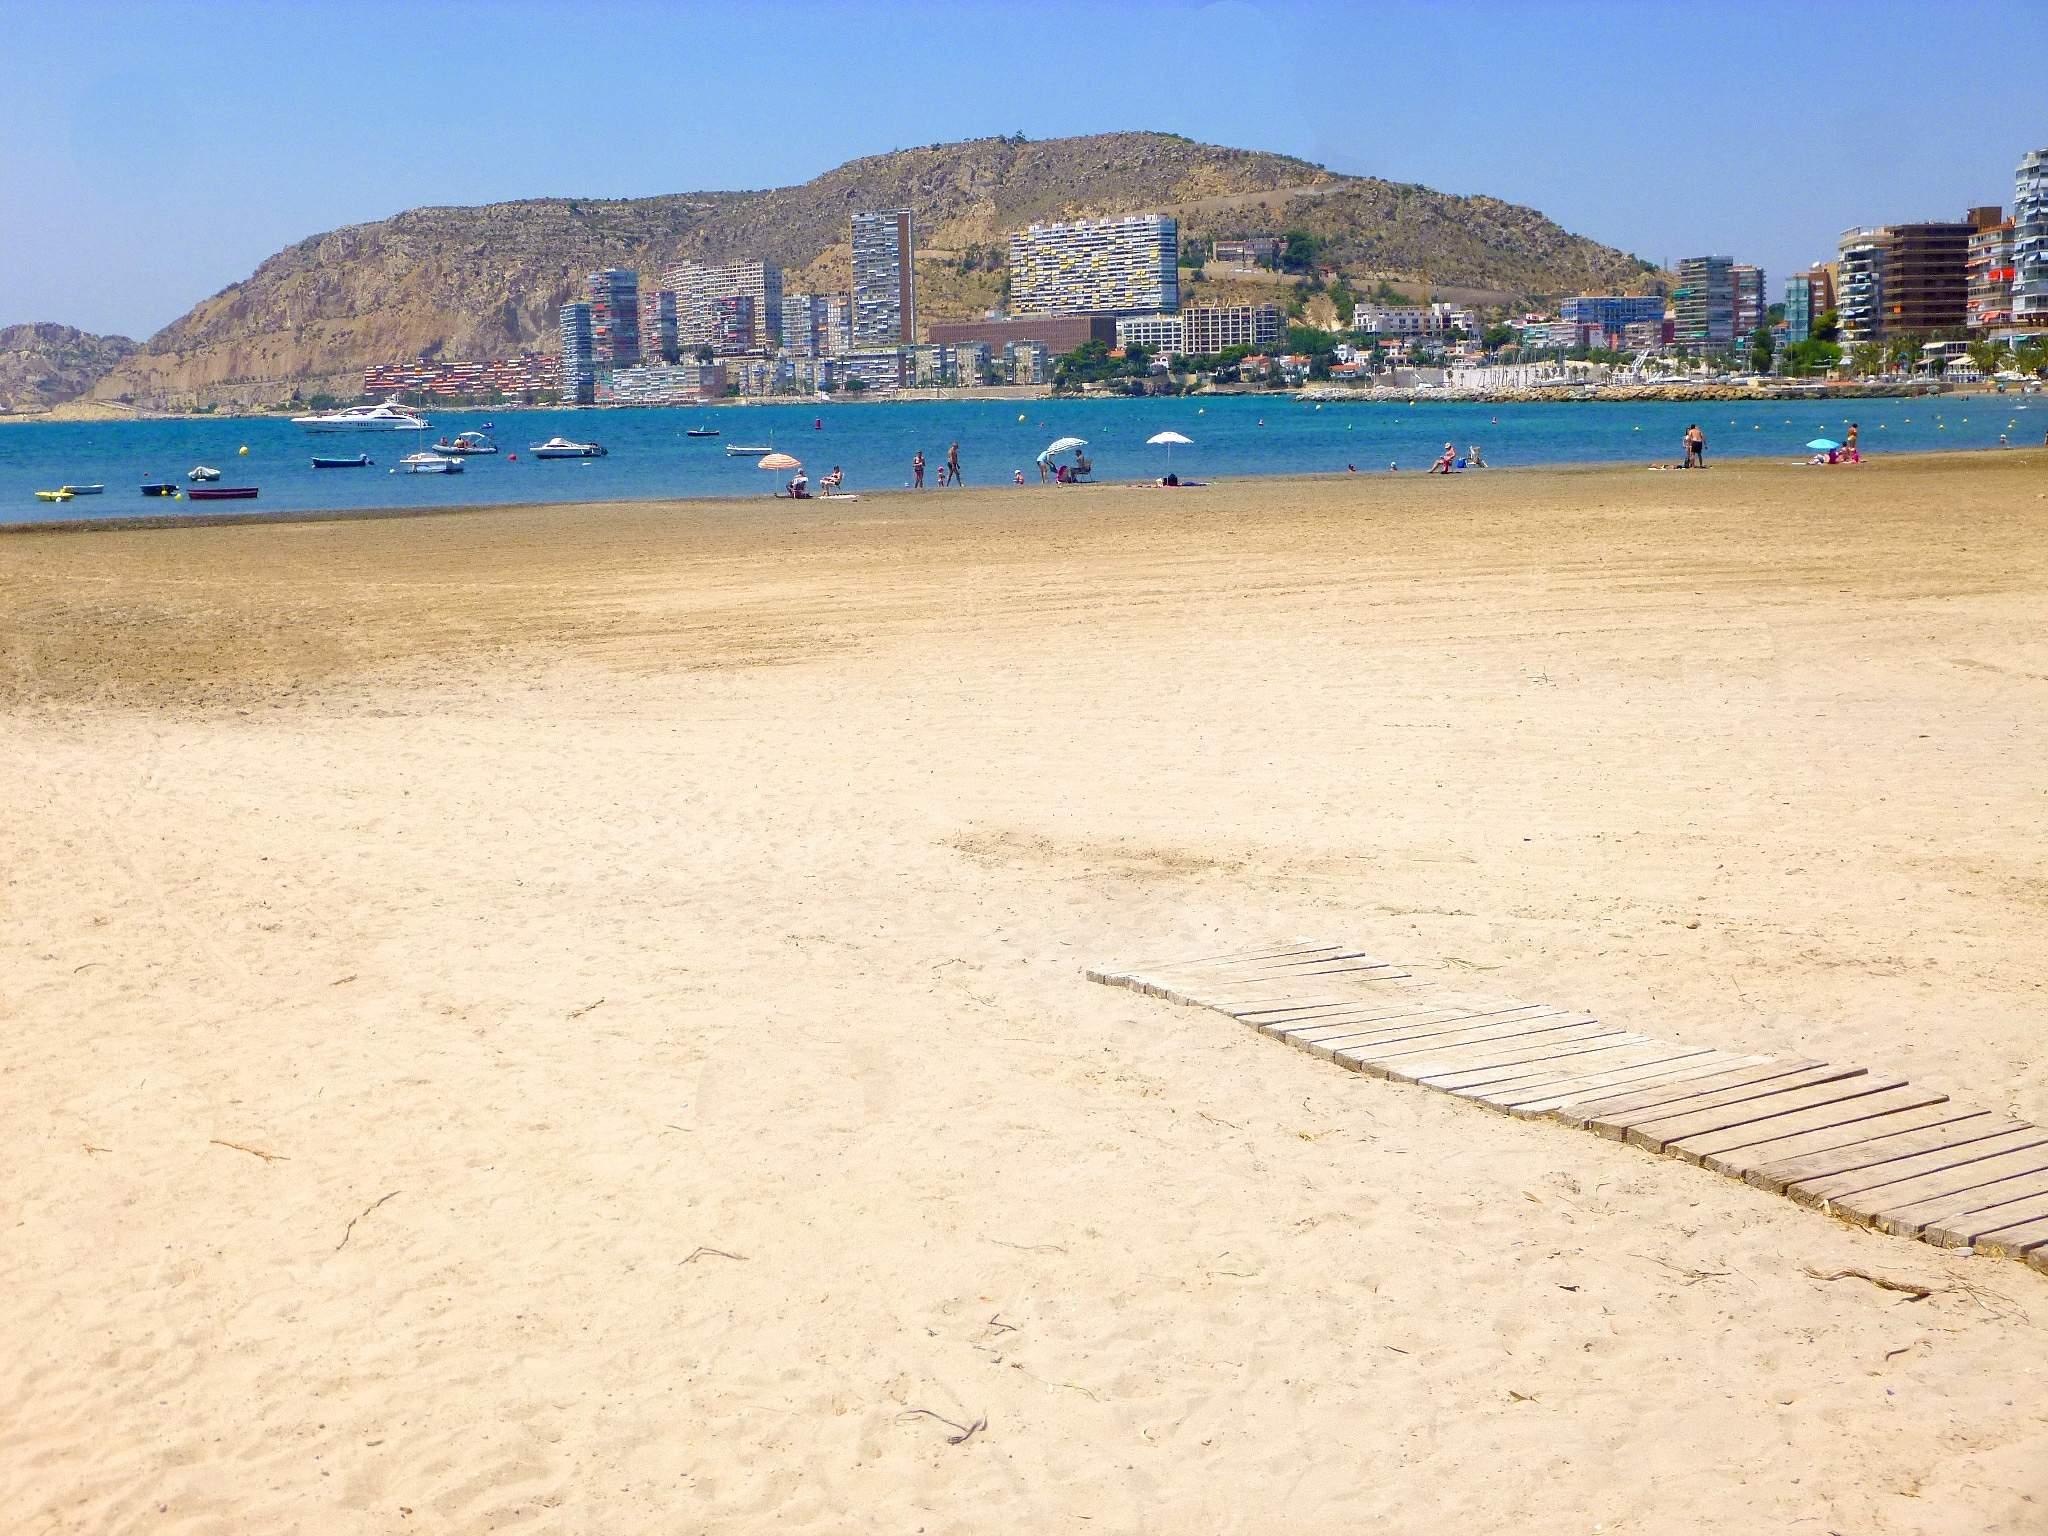 Almadraba Beach Alicante Kasa25 Best Beaches